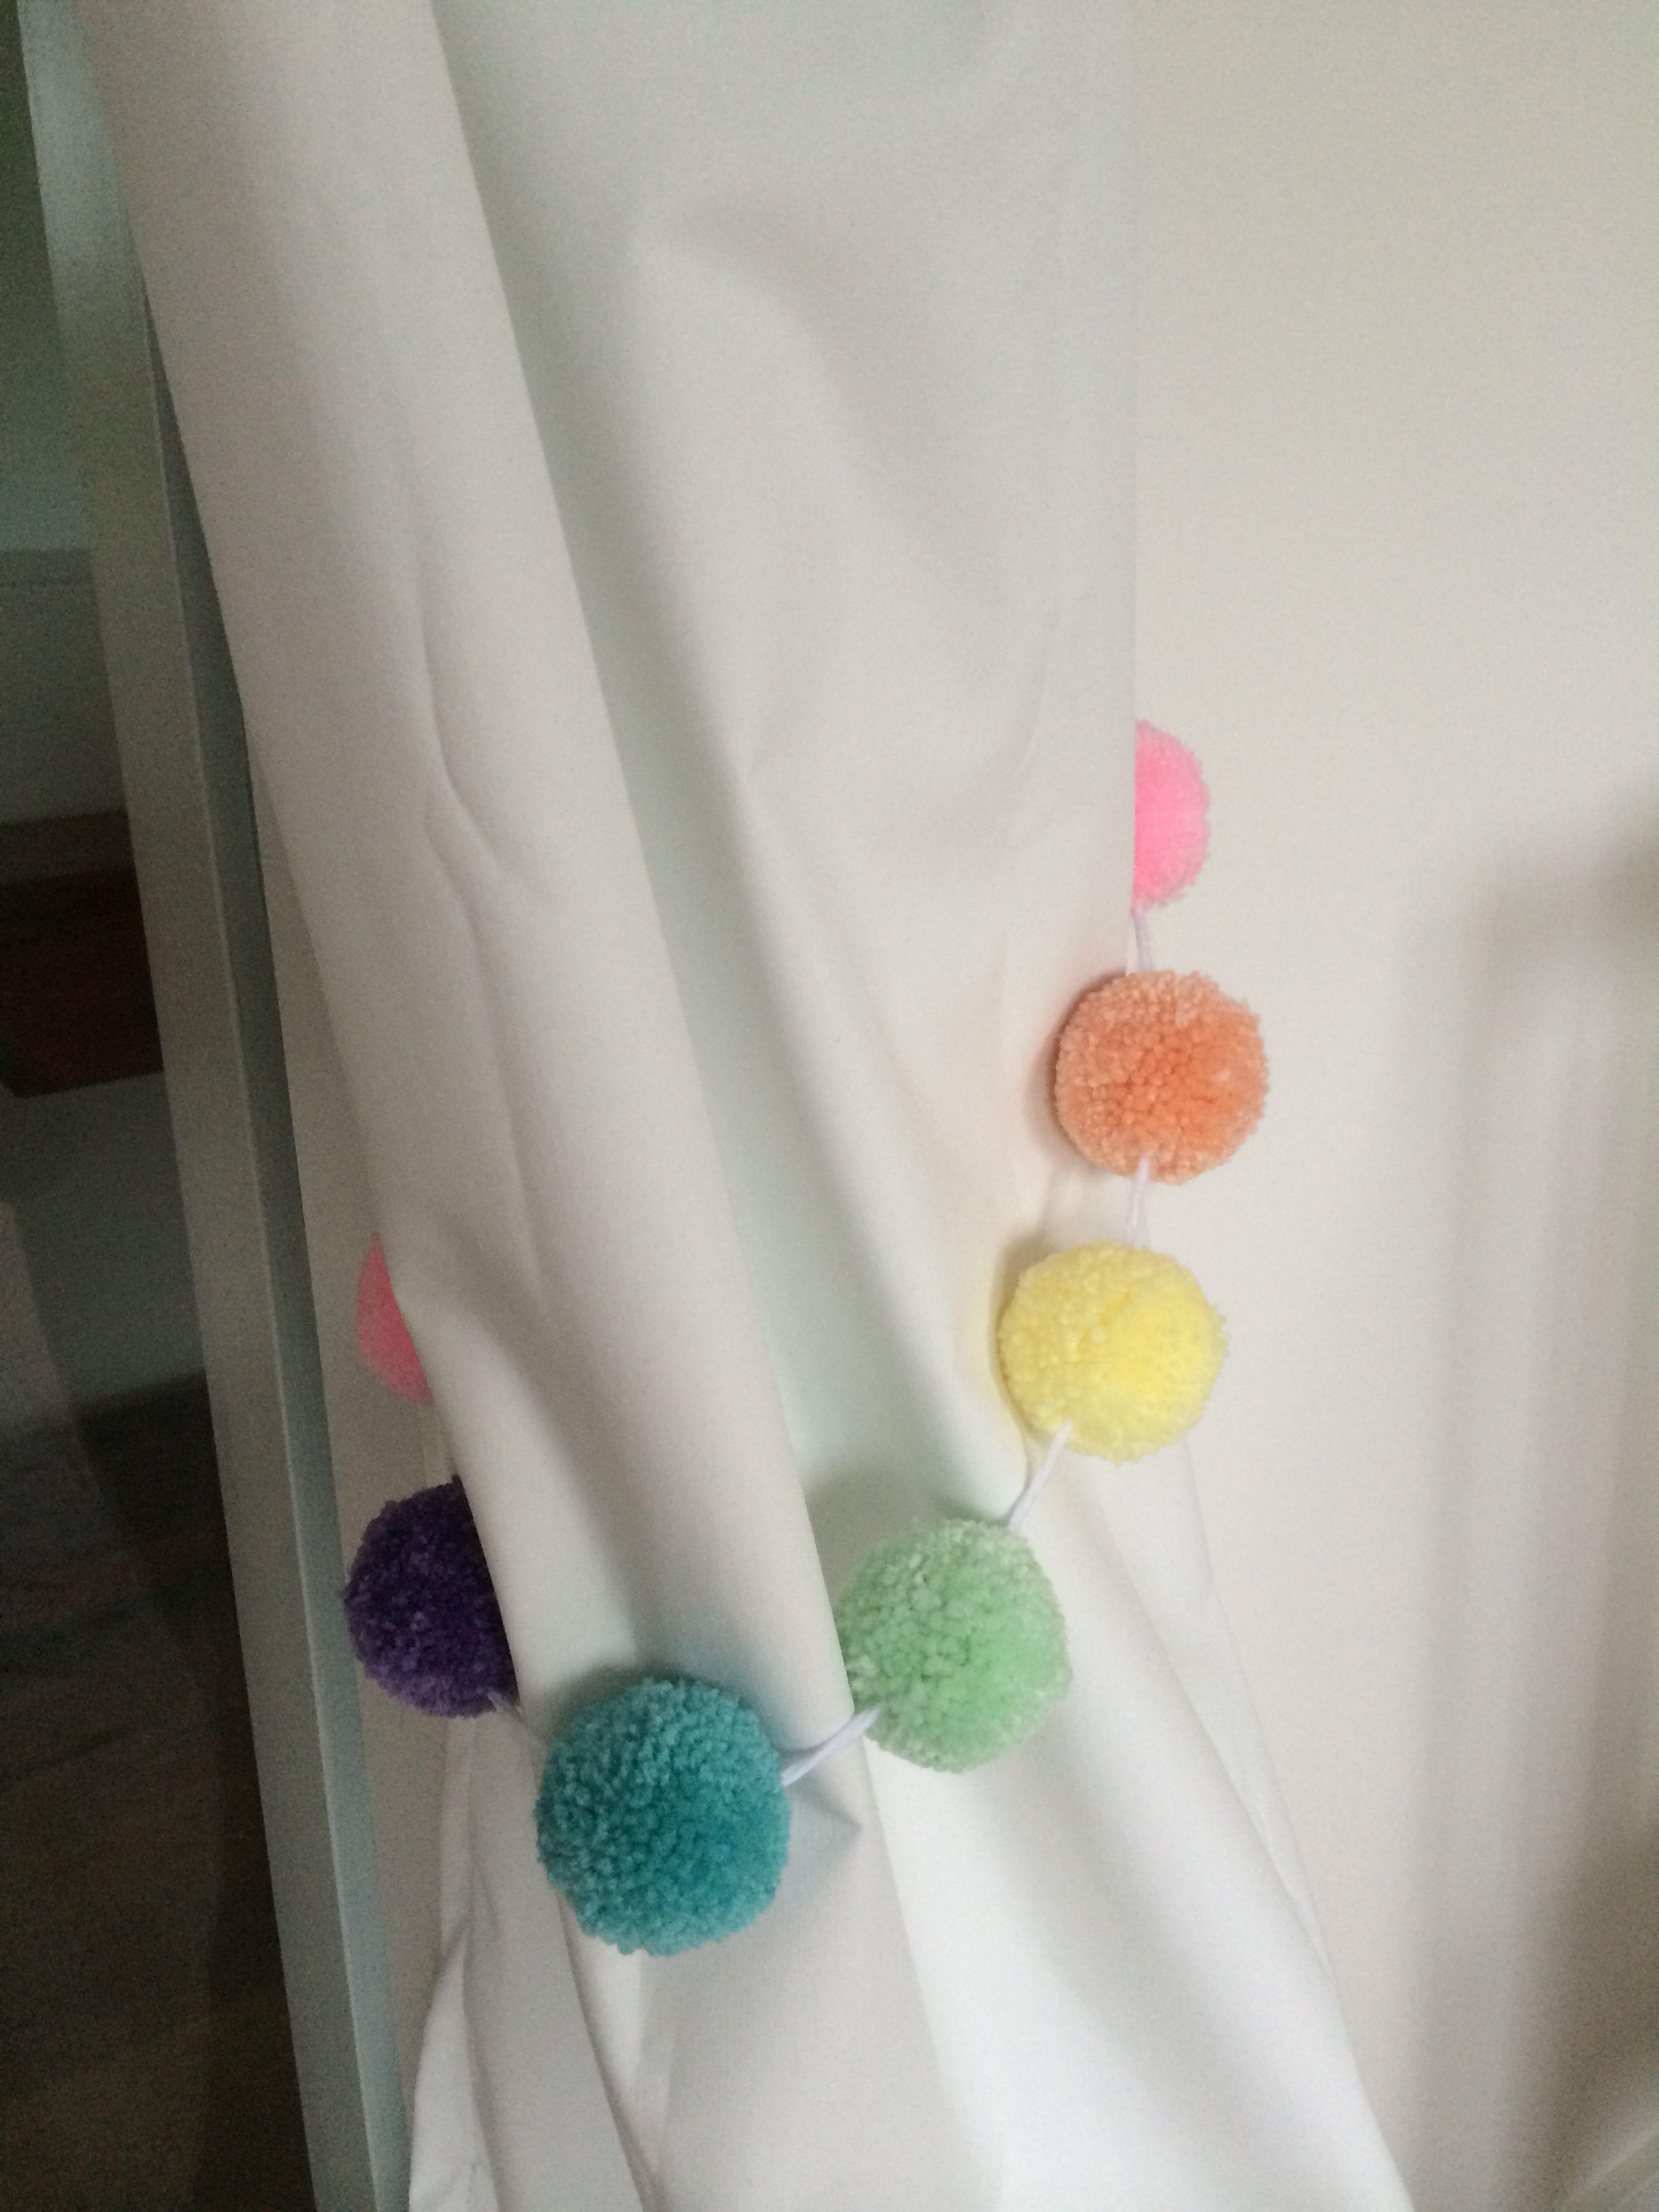 Curtain Tie Backs Made Using Pom Pom Garland By Justembellish